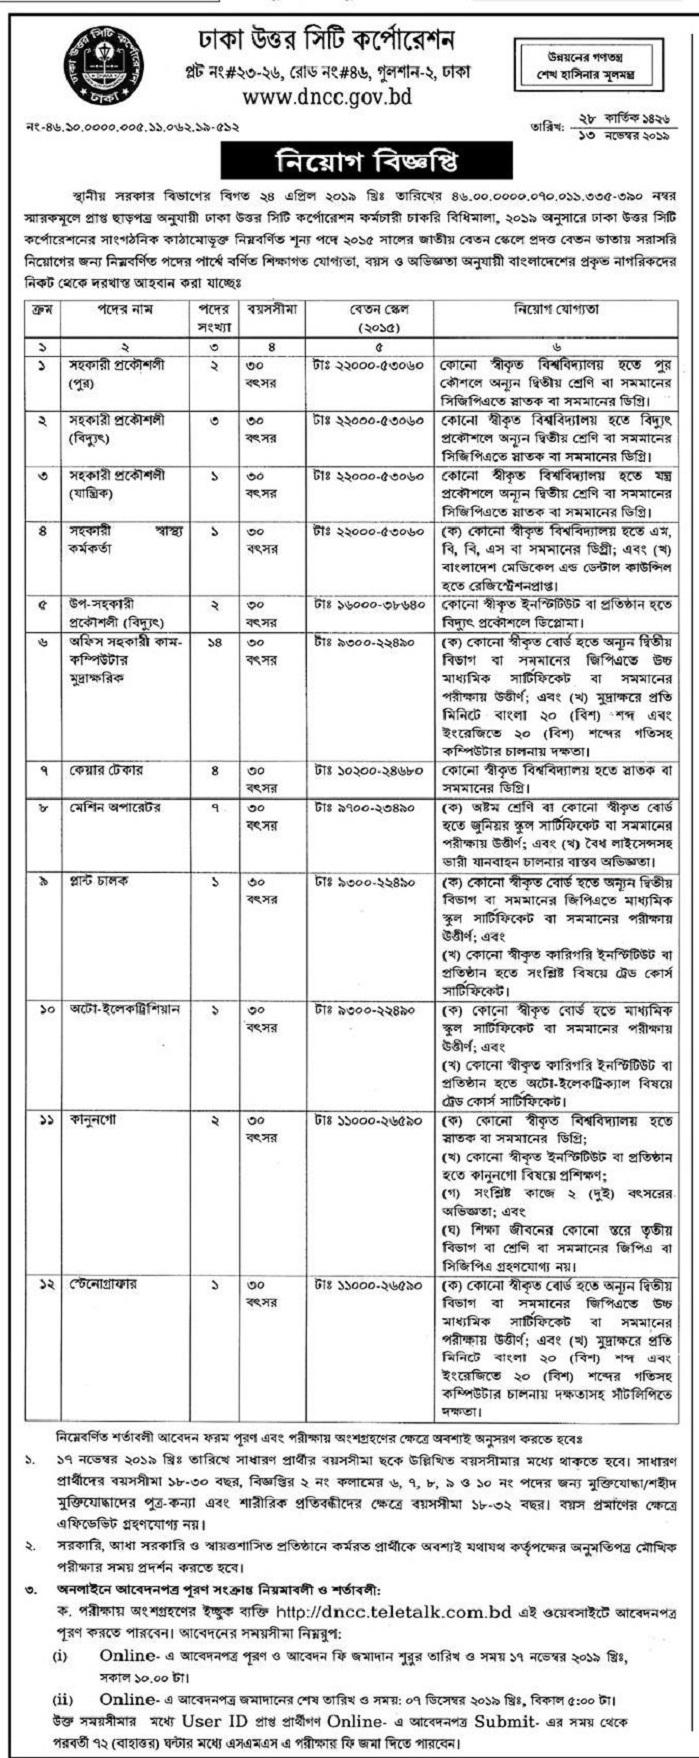 Dhaka North City Corporation Job Circular 2019